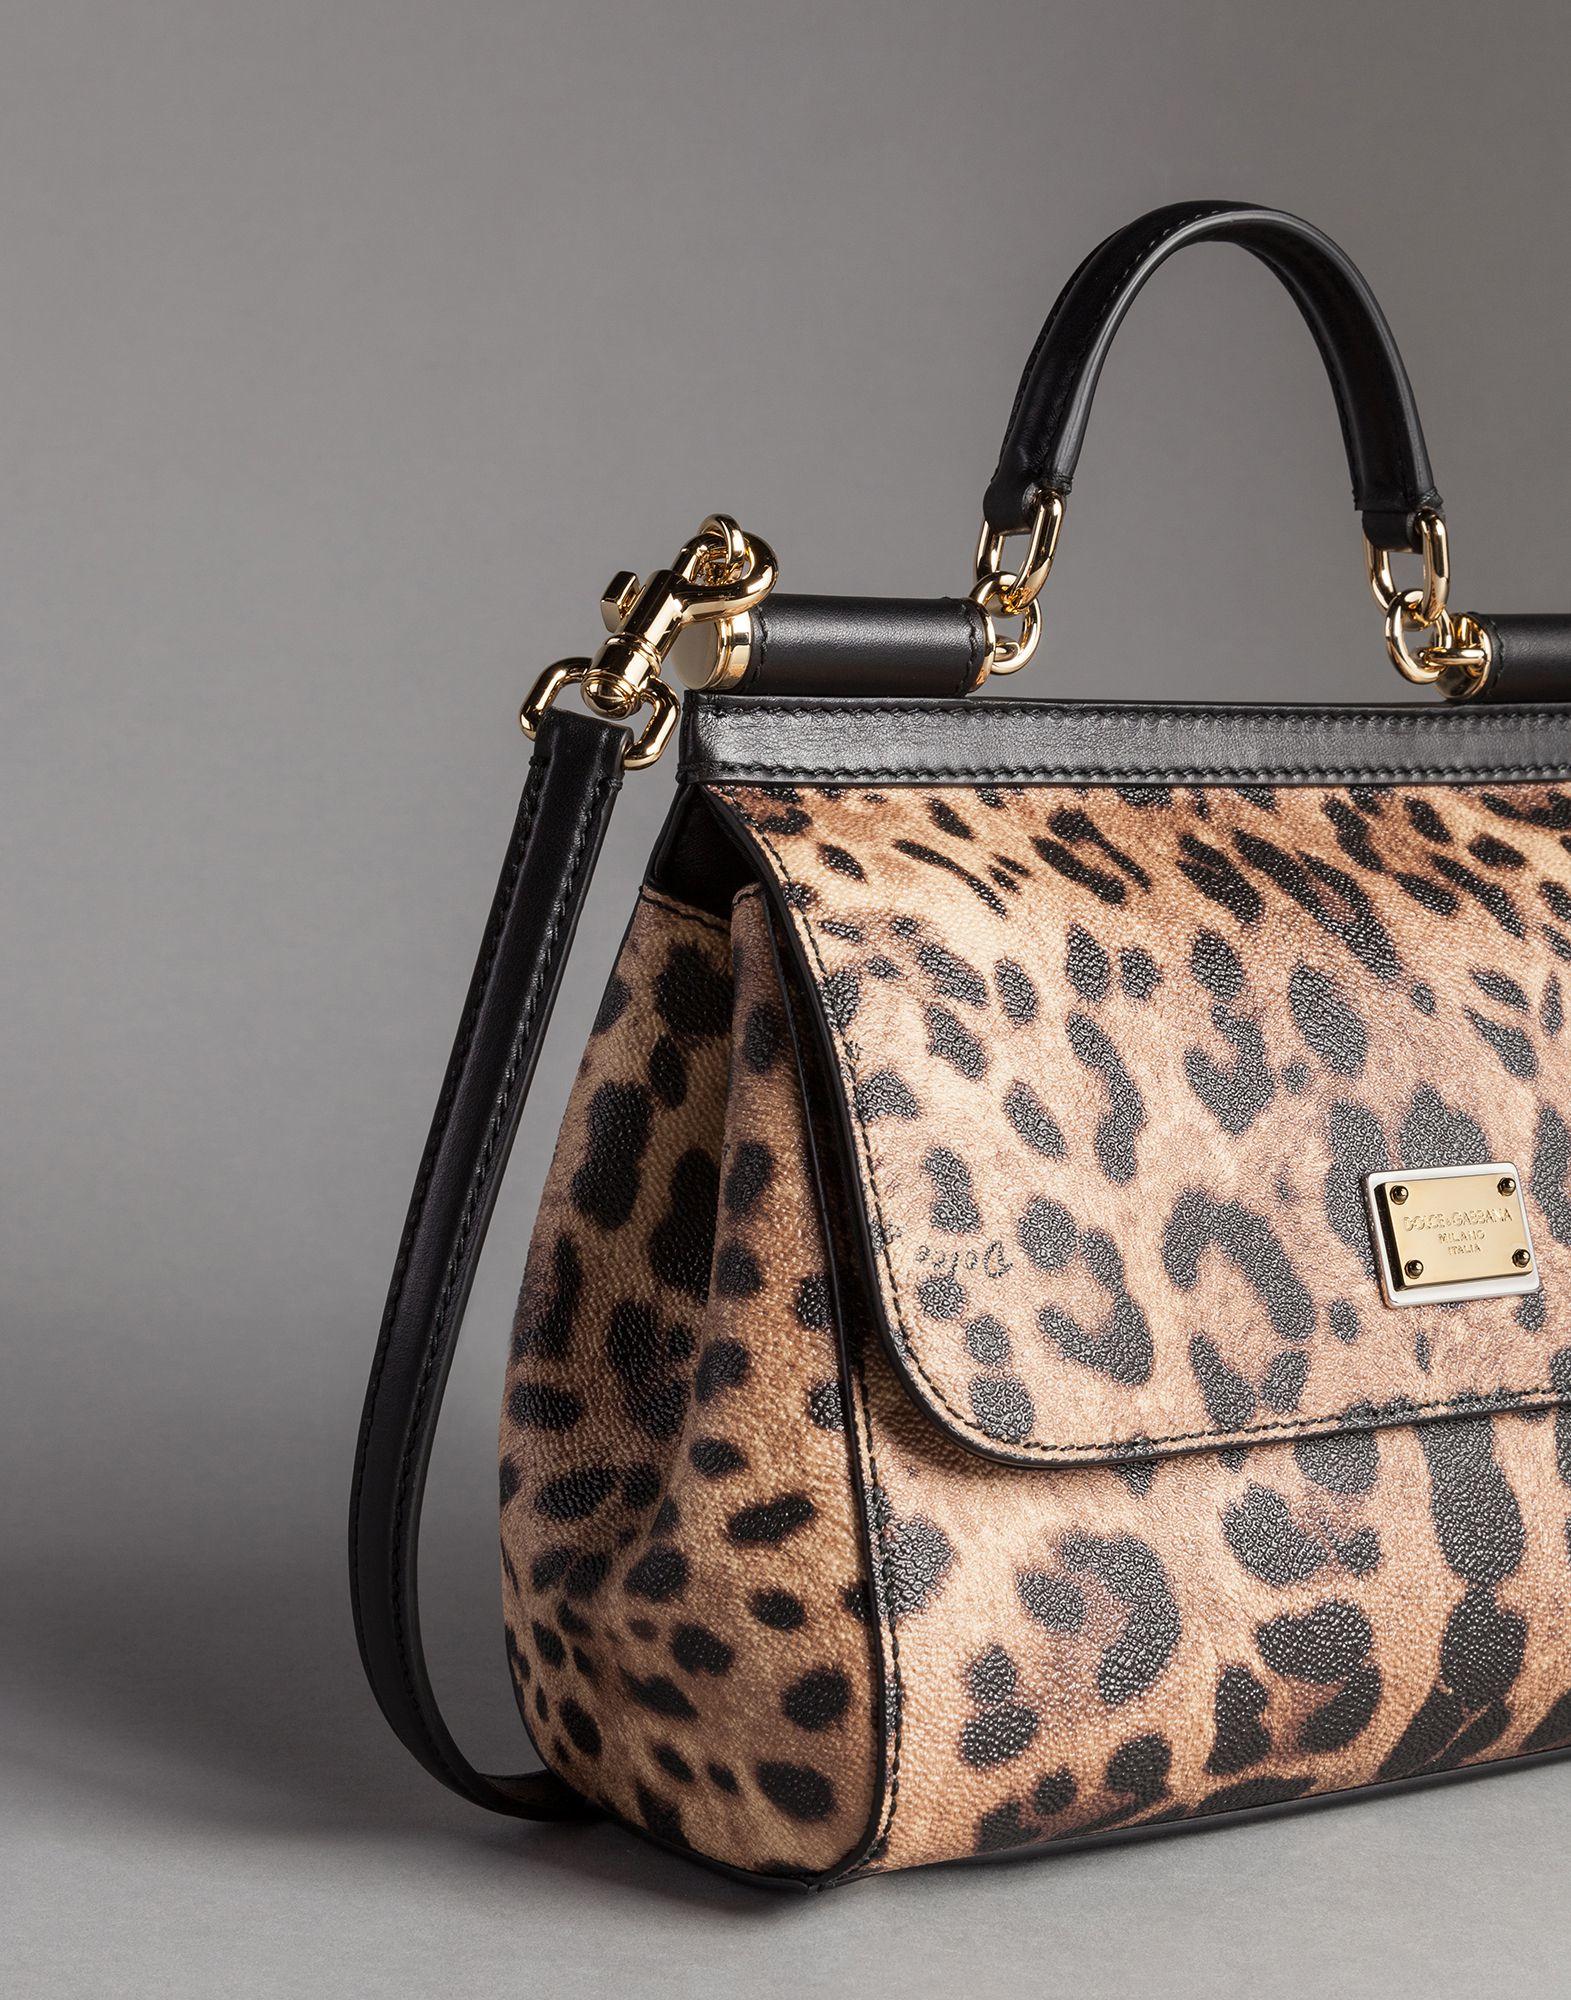 7c5b40f0c523 Lyst - Dolce   Gabbana Medium Sicily Bag In Leopard Textured Leather ...